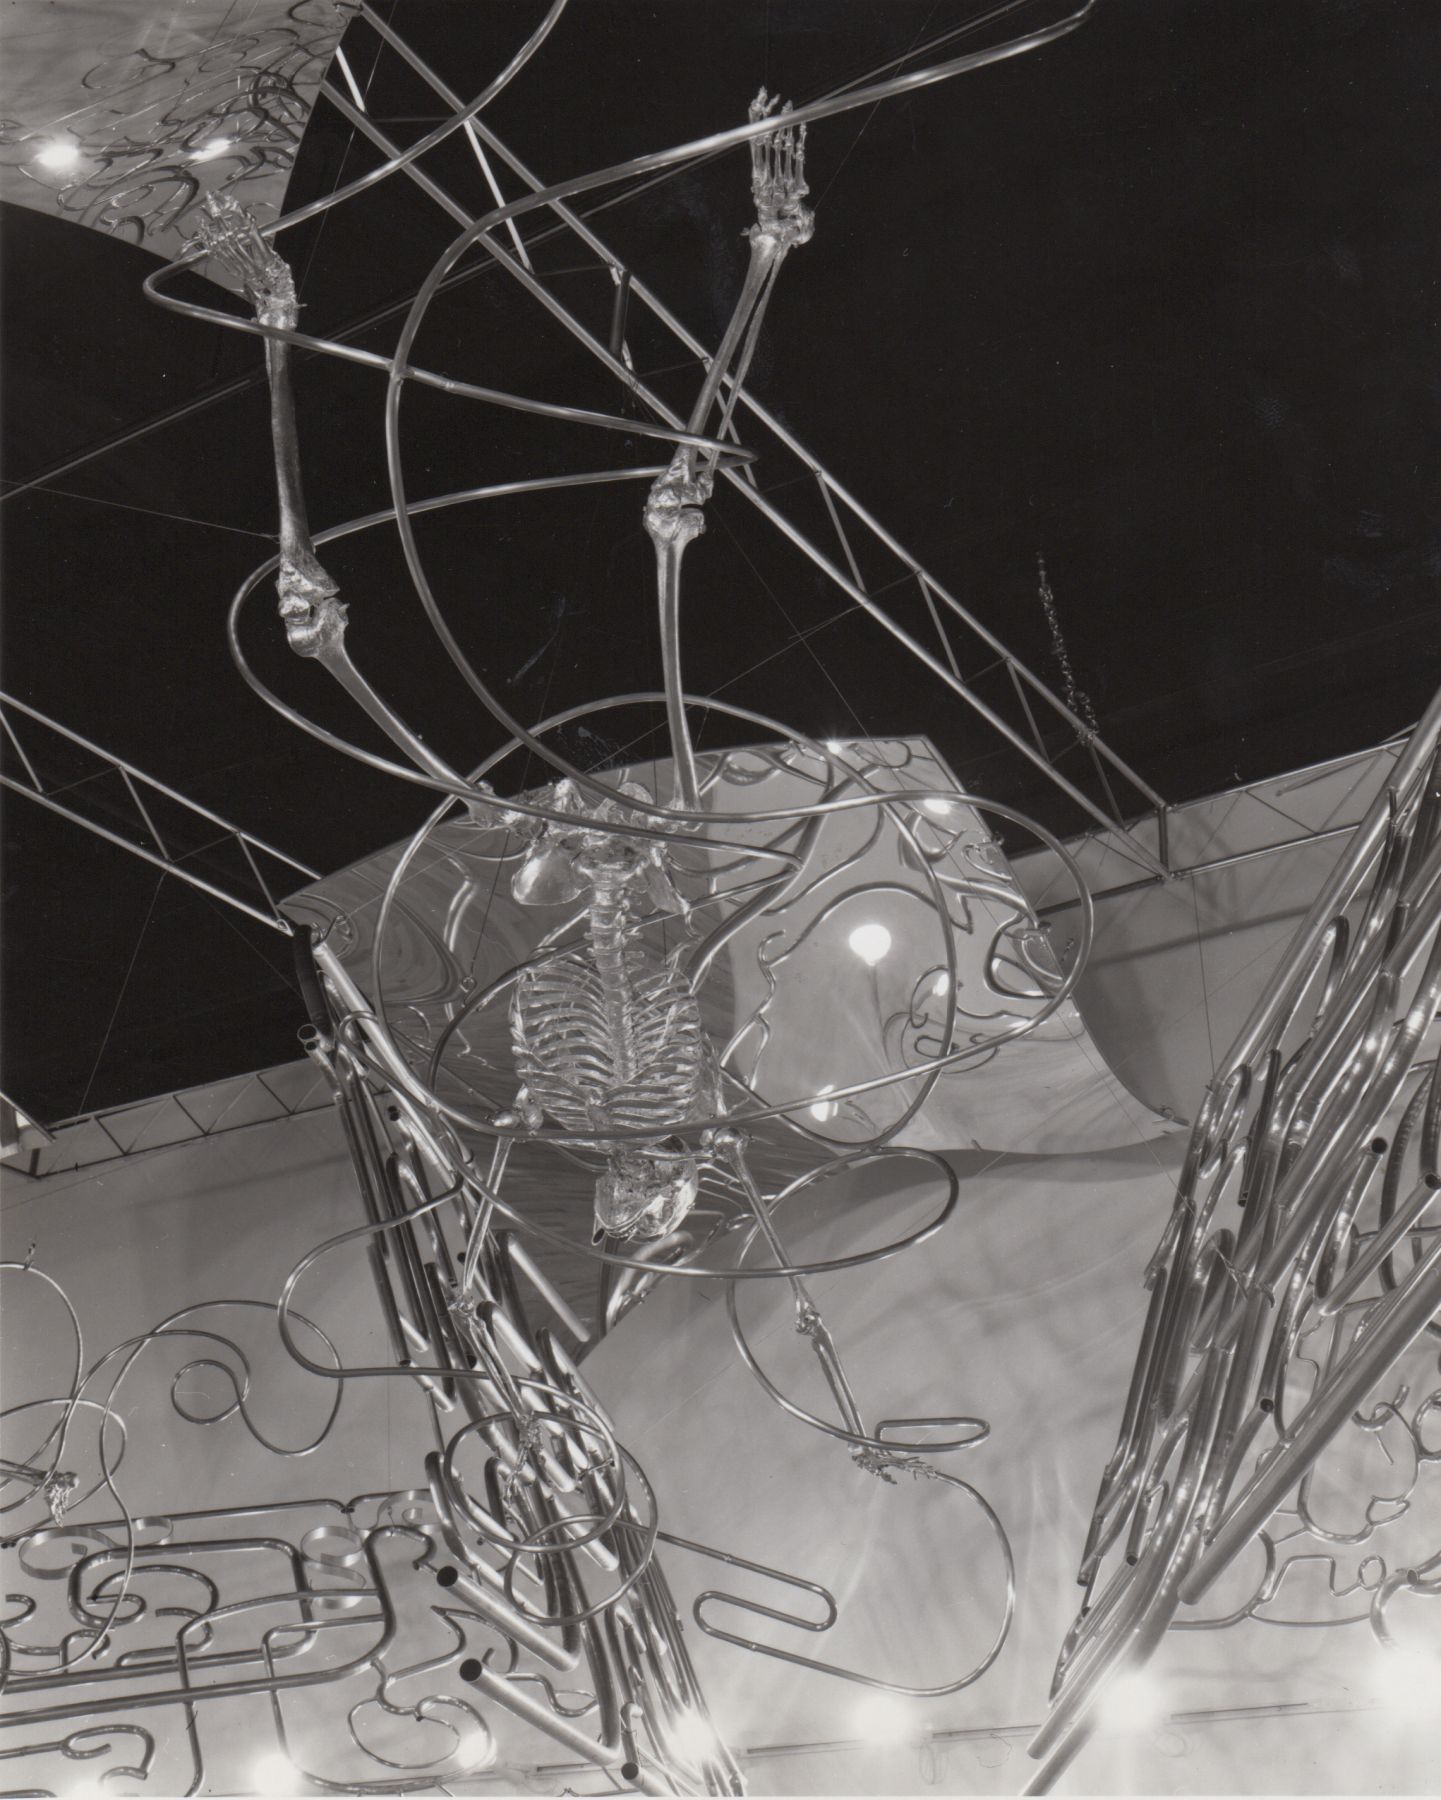 Installation view, Robert Morris, 142 GREENE.